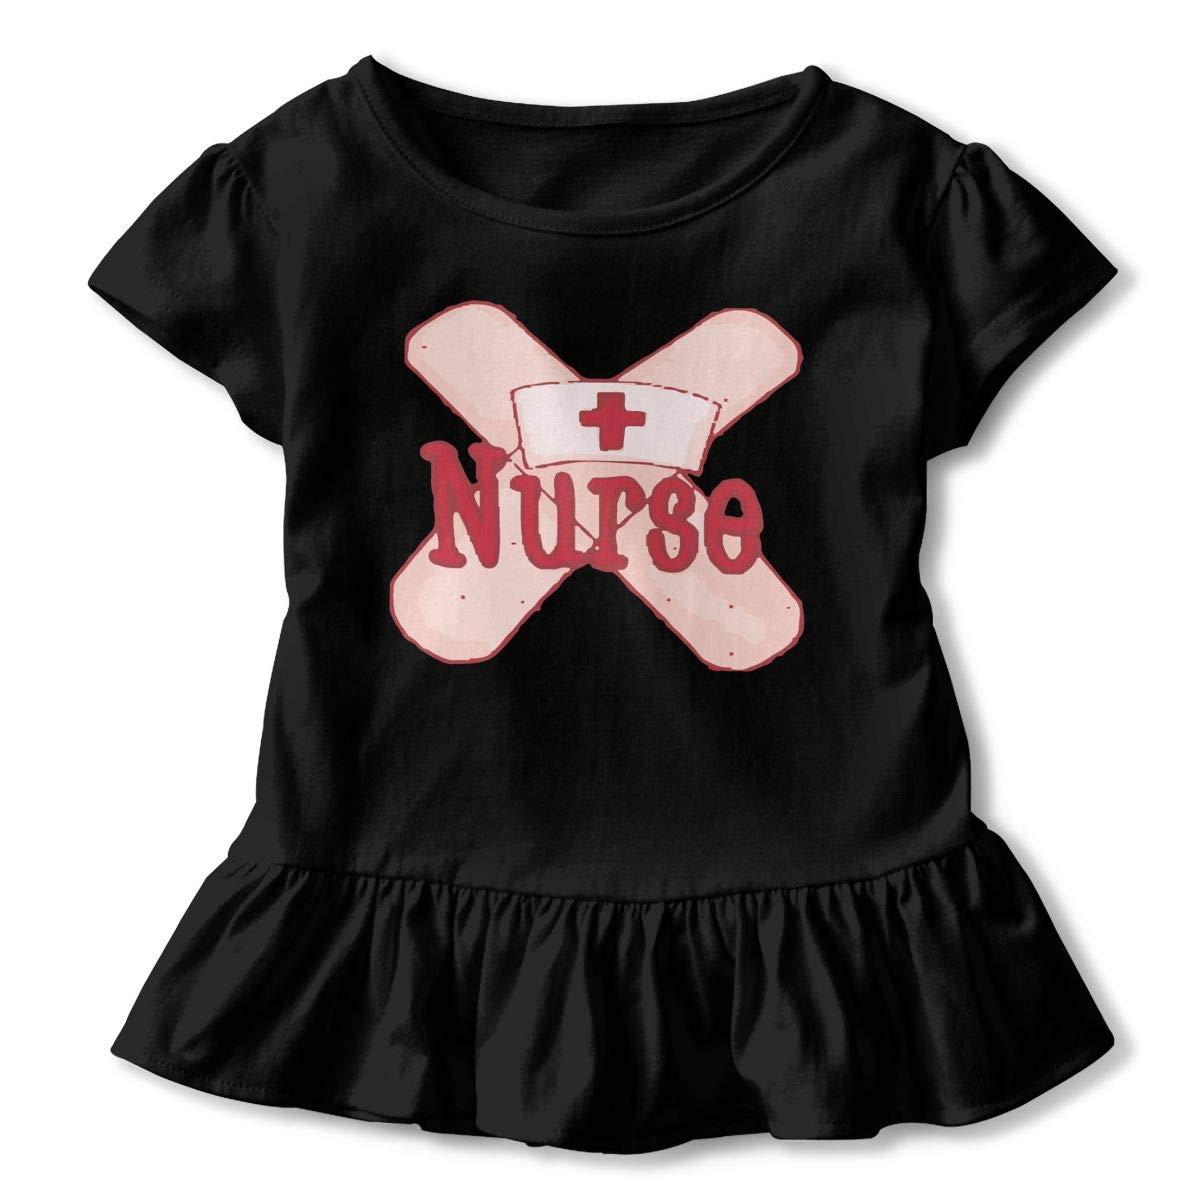 CZnuen Nurse Bandage Cartoon 2-6T Baby Girls Cotton Jersey Short Sleeve Ruffle Tee